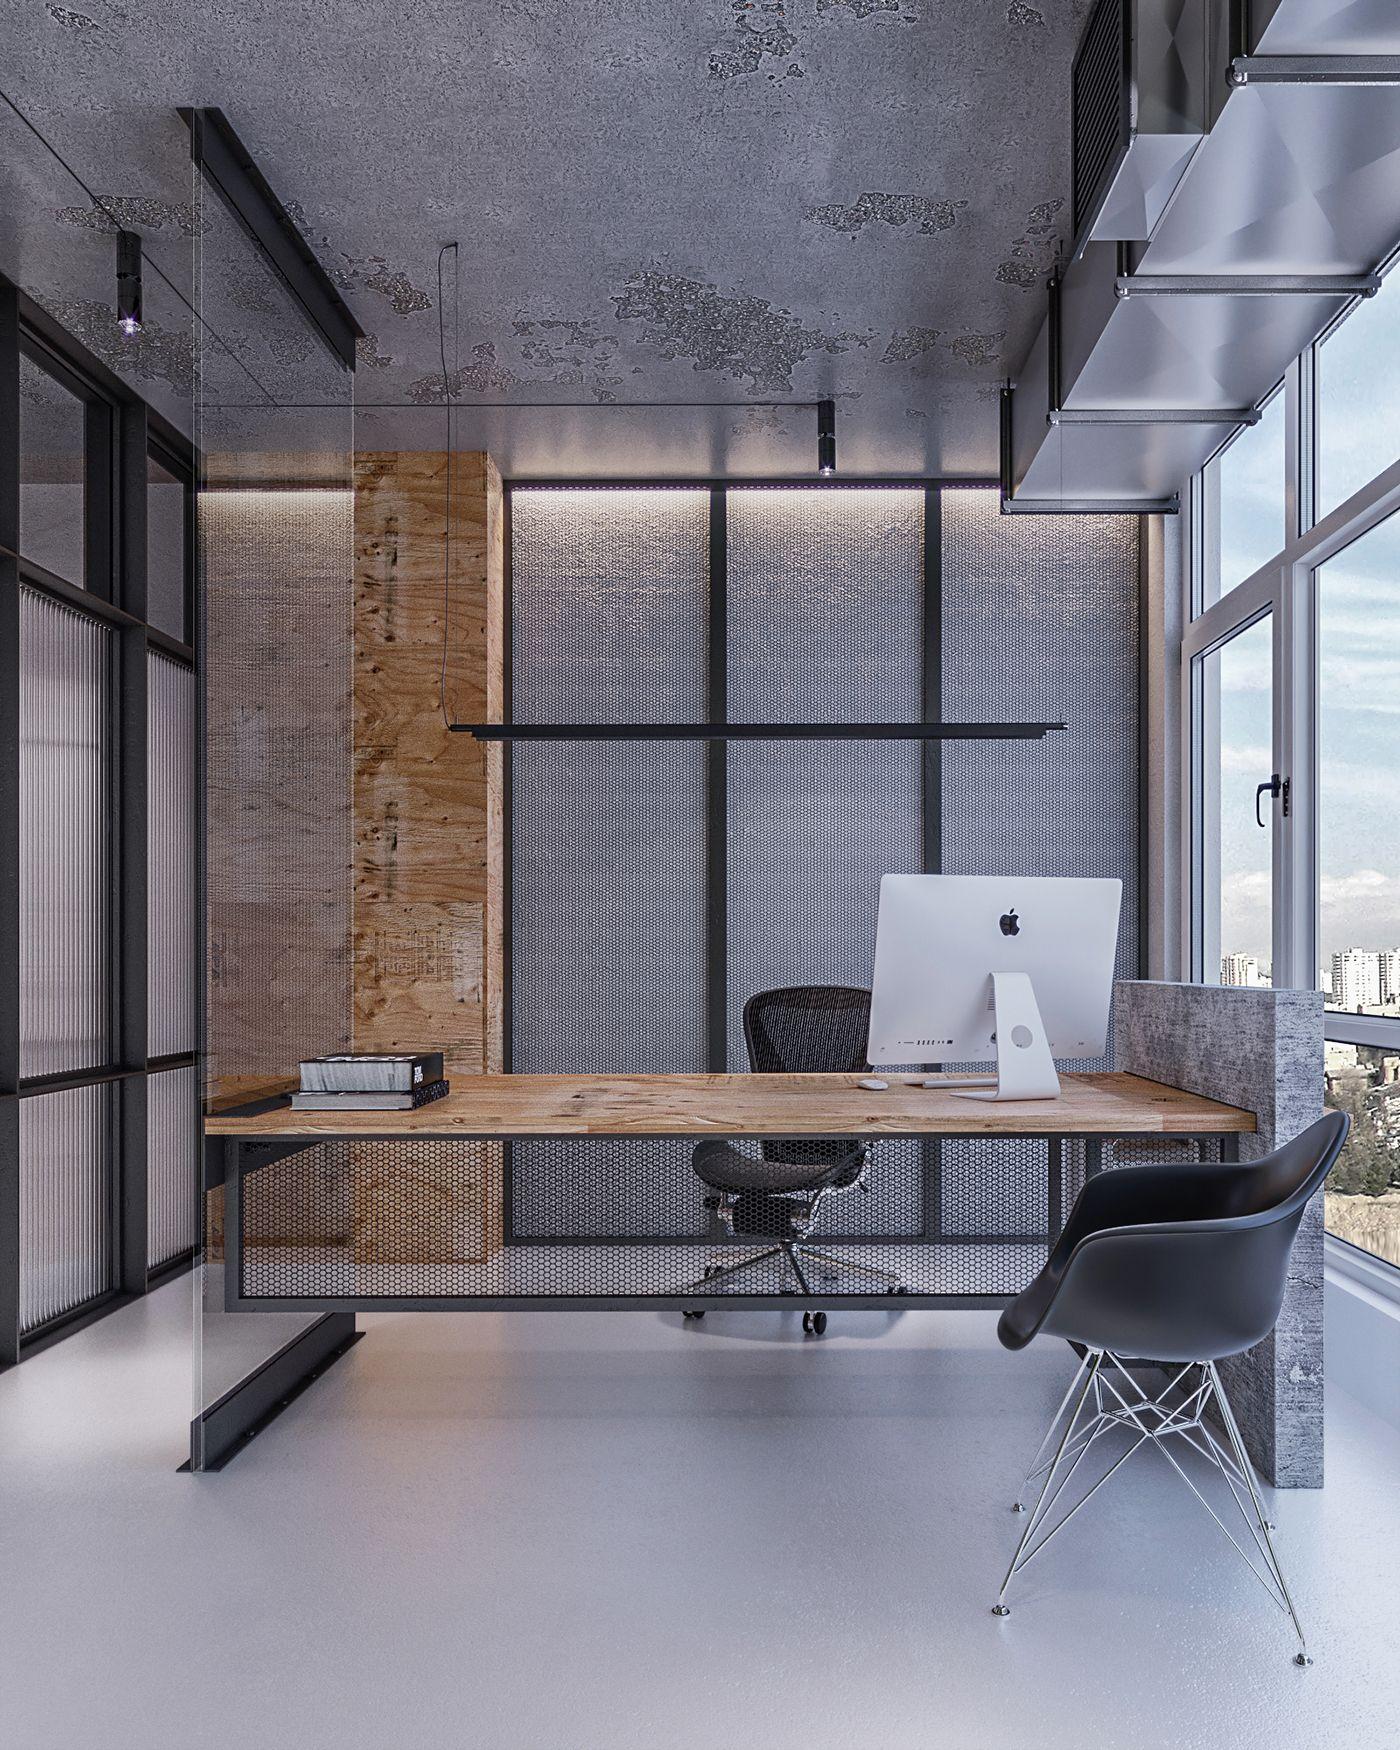 Industrial office studio on Behance | Office & Working ...